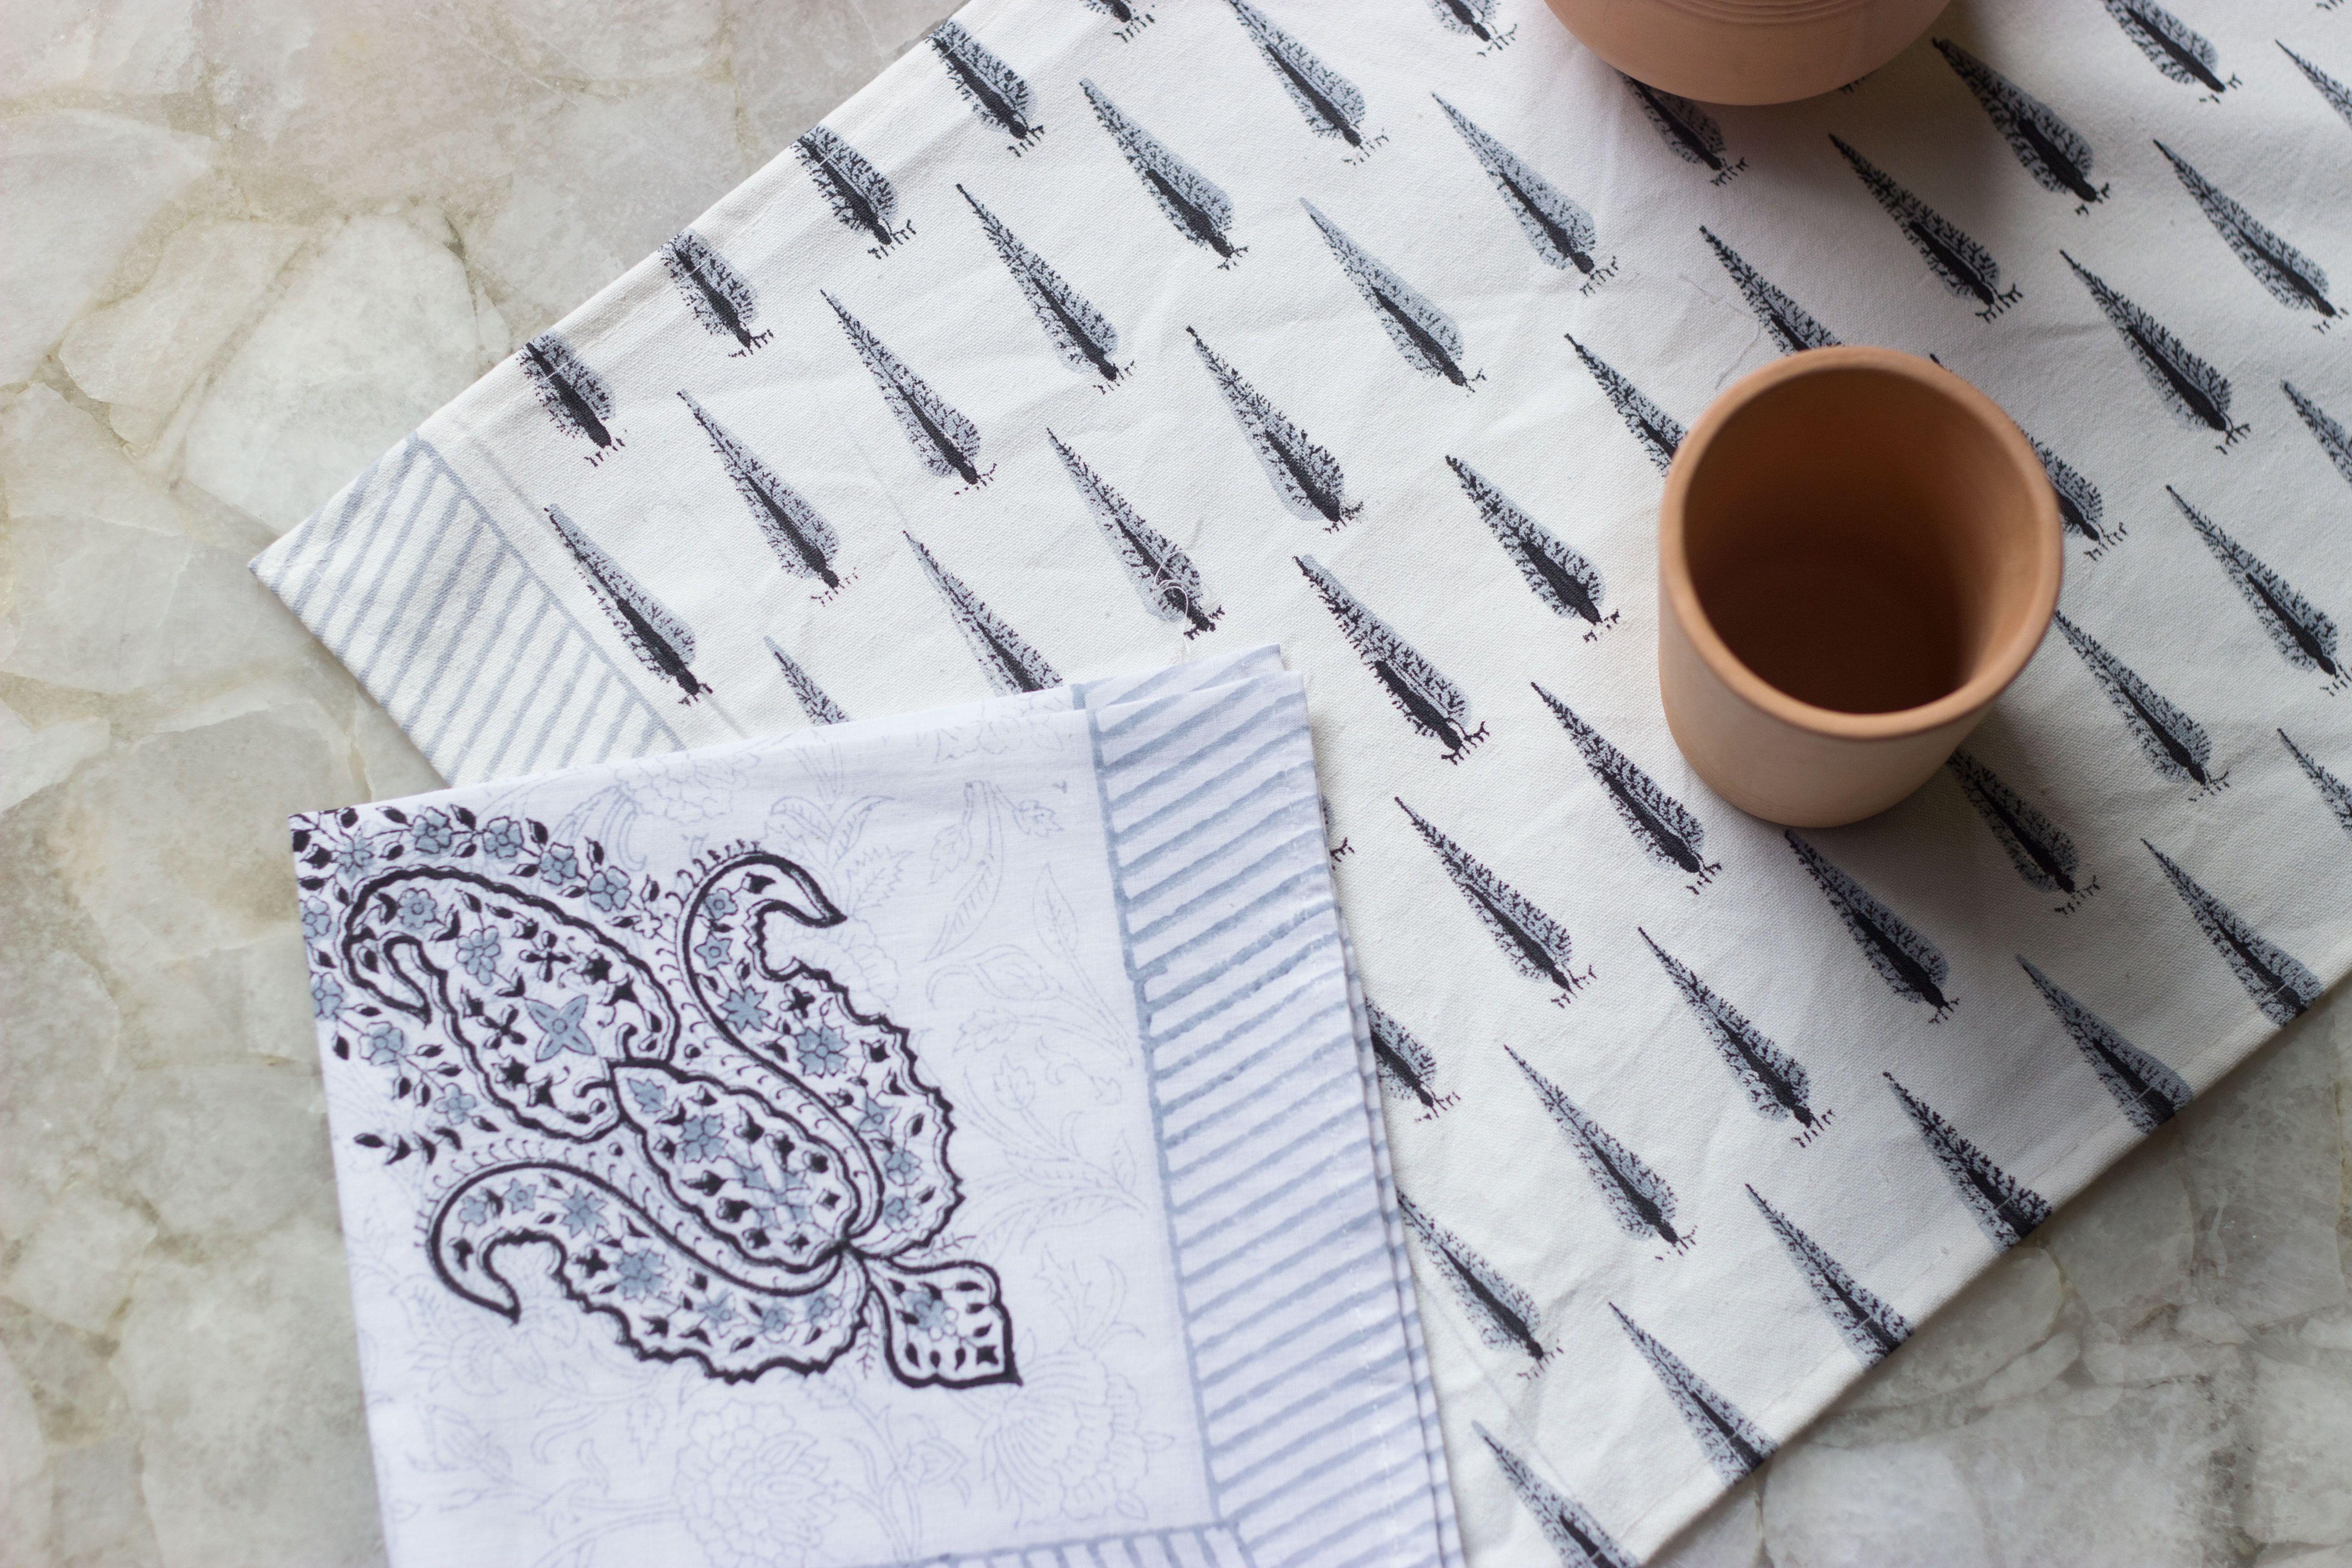 Indian Hand Block-Printed Napkins Set of 6